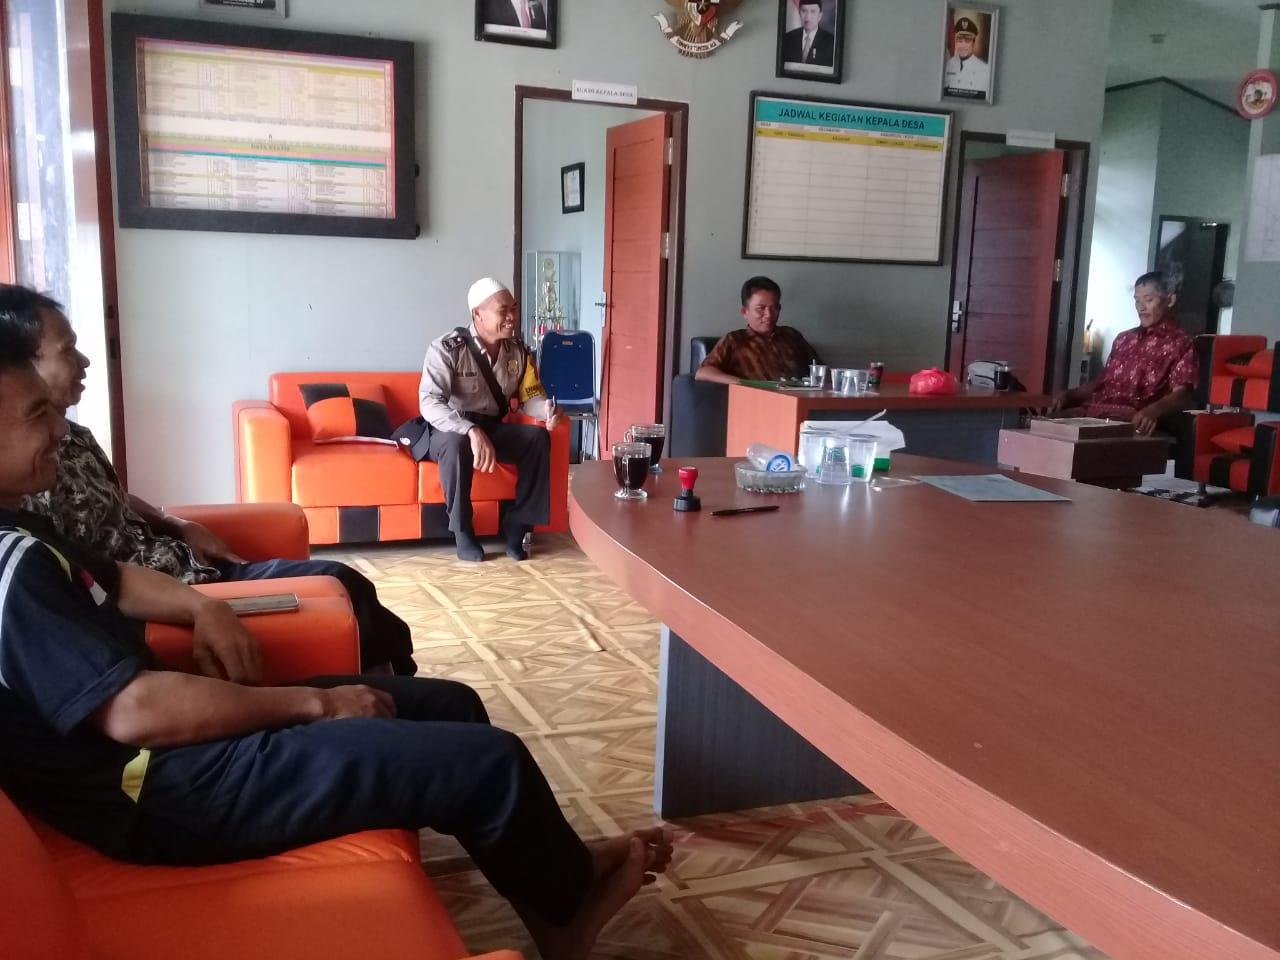 Bhabinkamtibmas Polsek Rantau Pulung Bertamu ke Kantor Kepala Desa